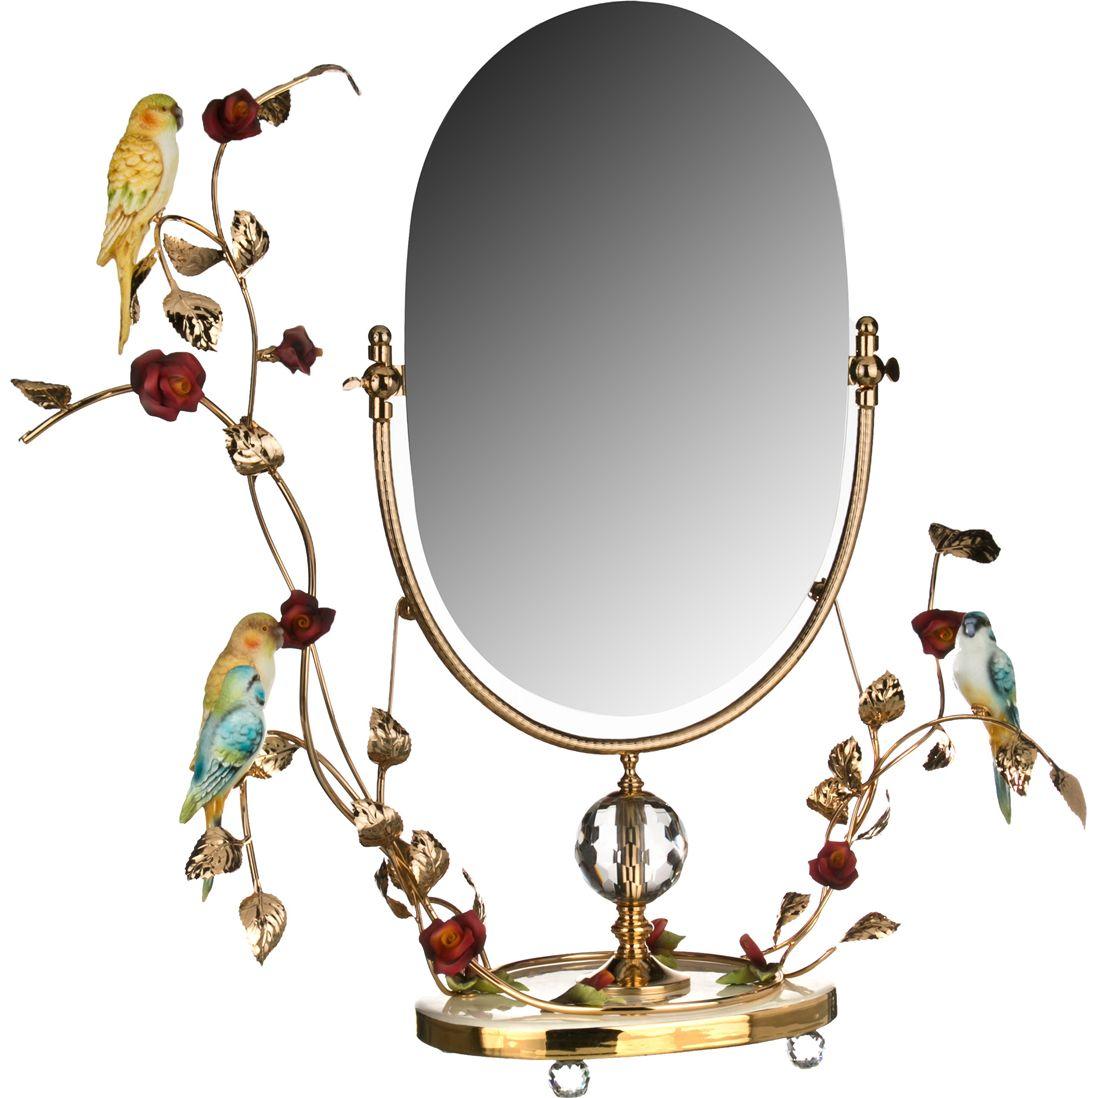 Картинки зеркала на прозрачном фоне, полугодием для девочки